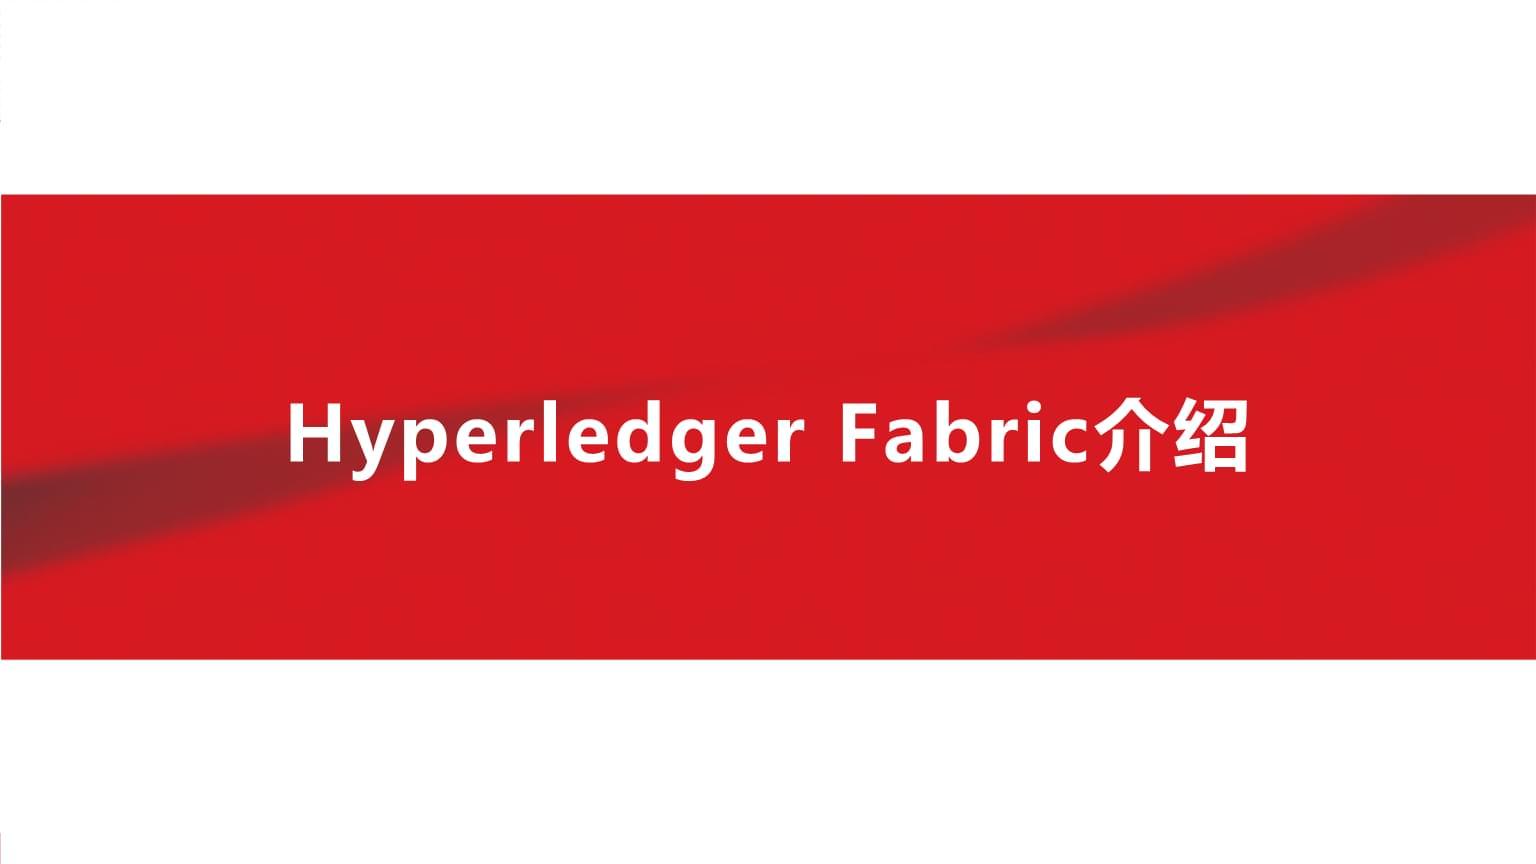 Hyperledger Fabric联盟链框架简介.pptx